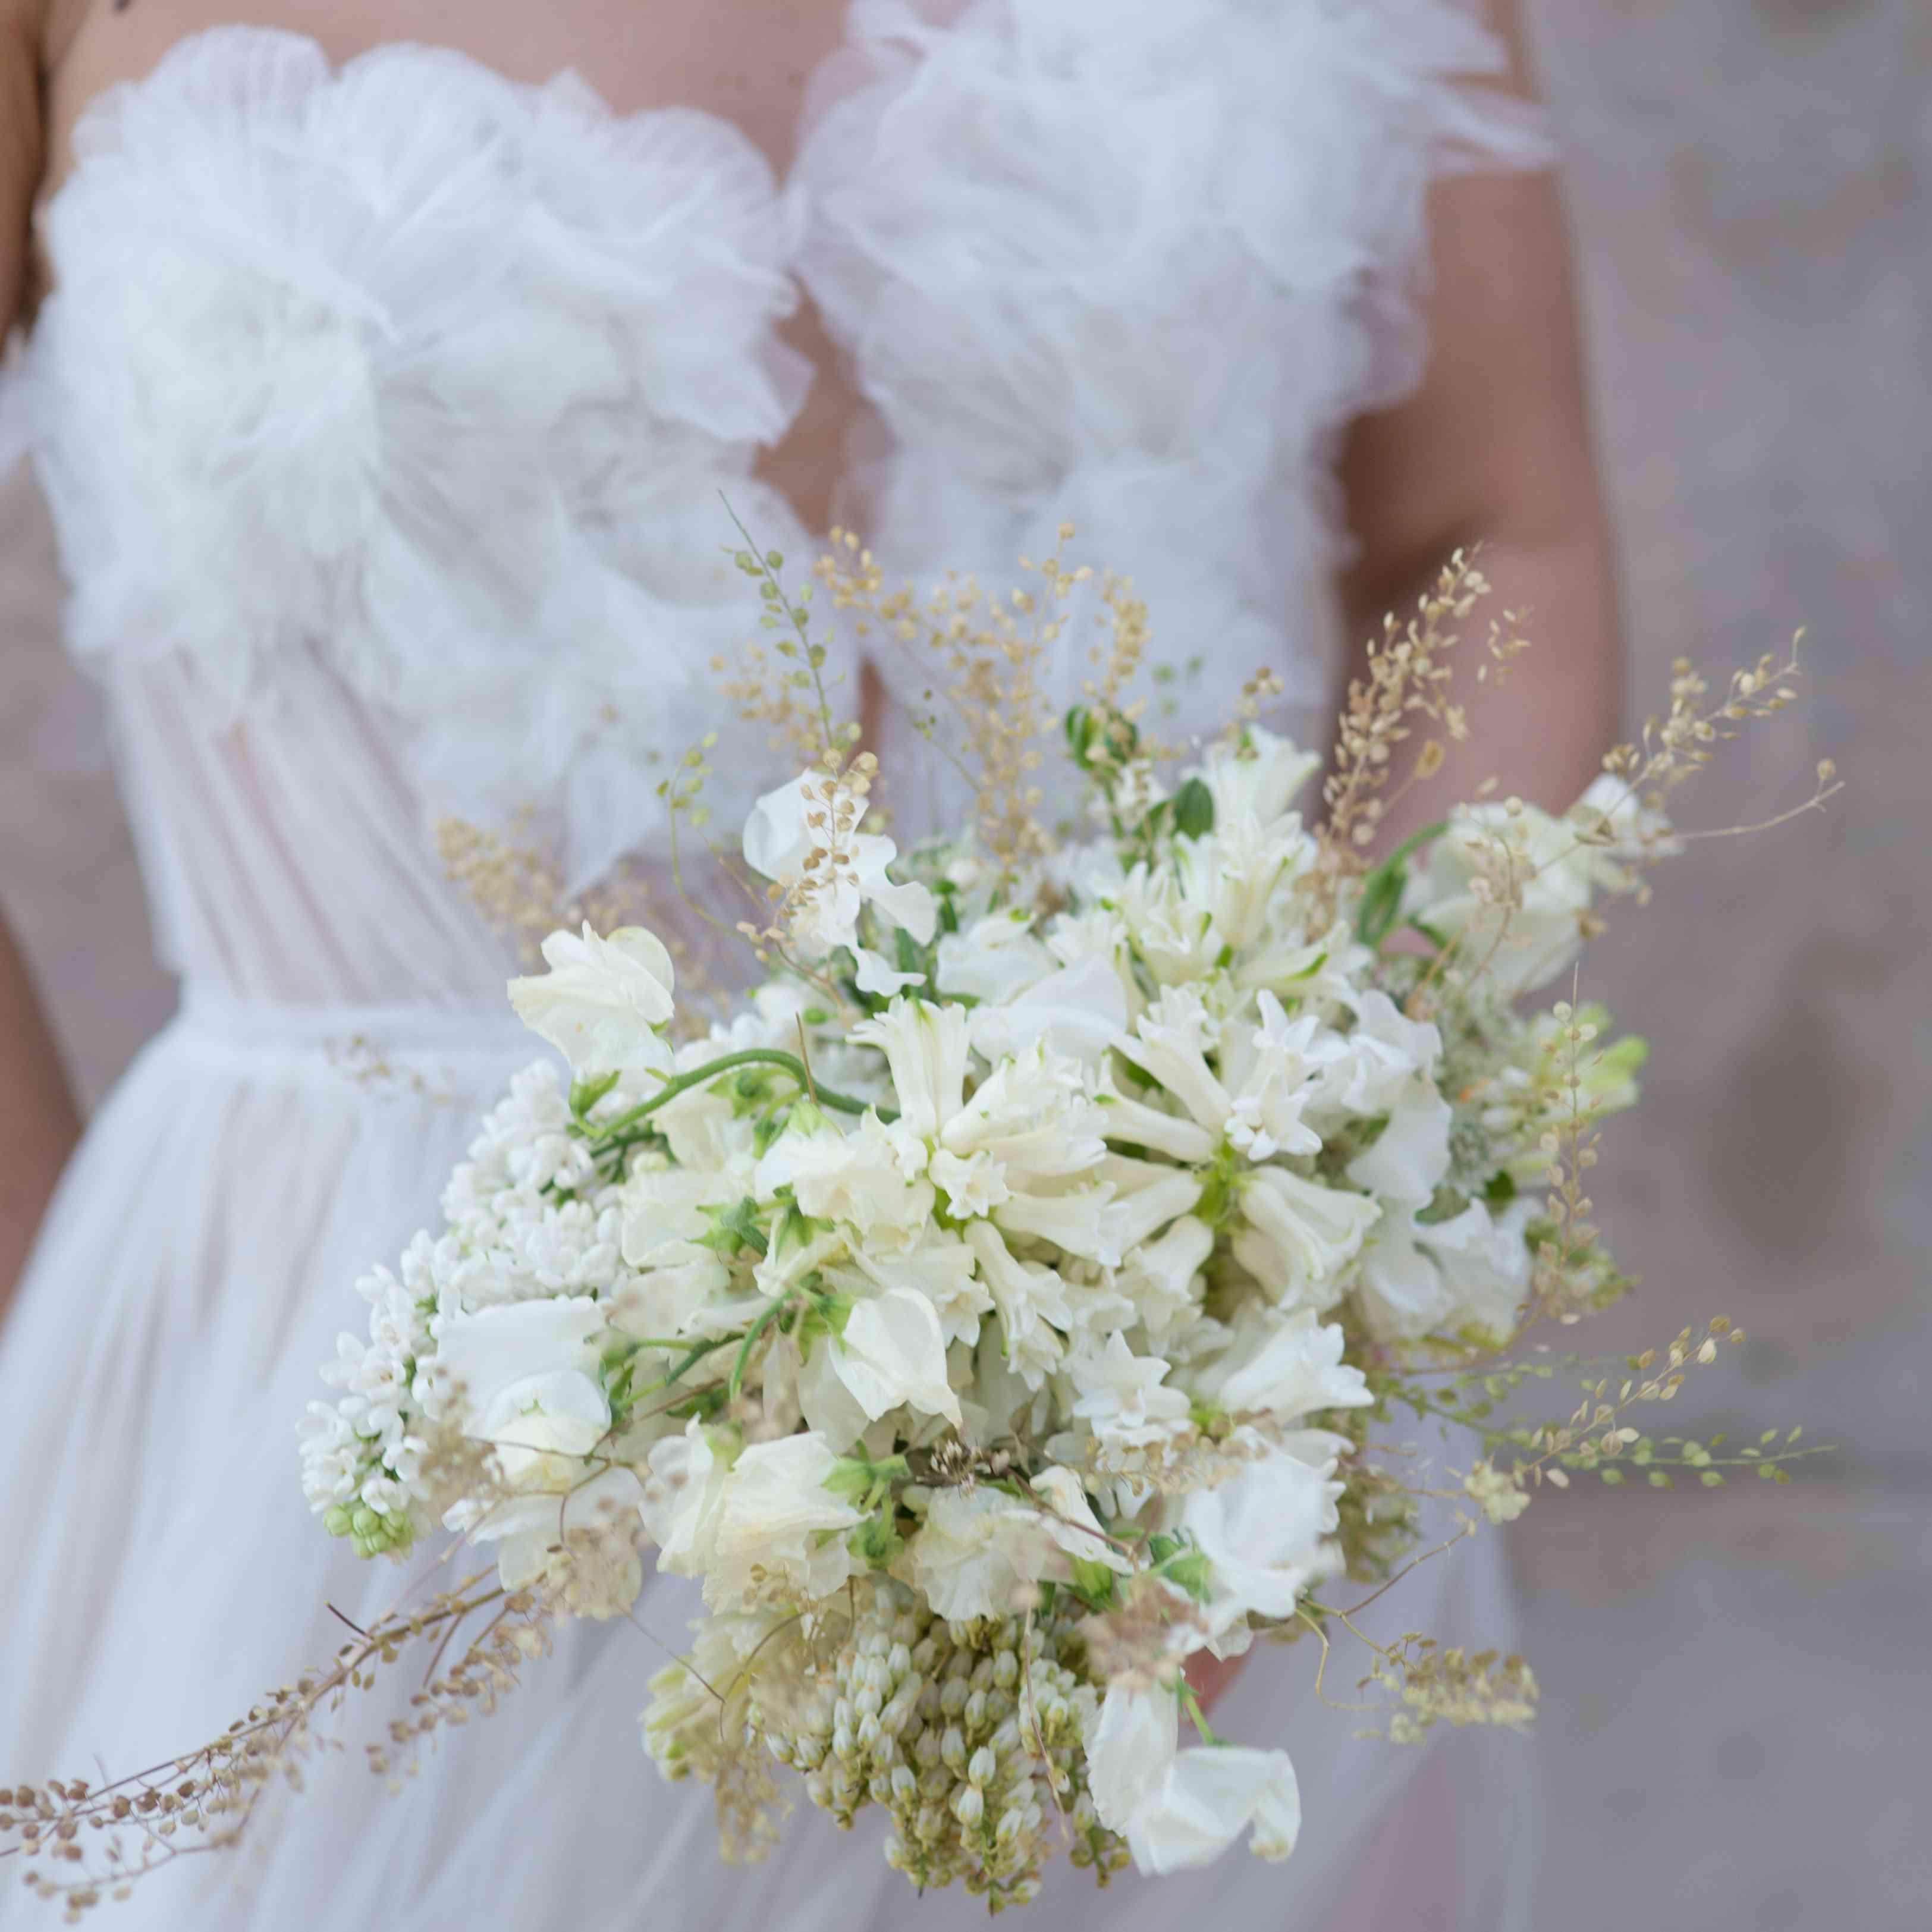 <p>white bride bouquet</p><br><br>